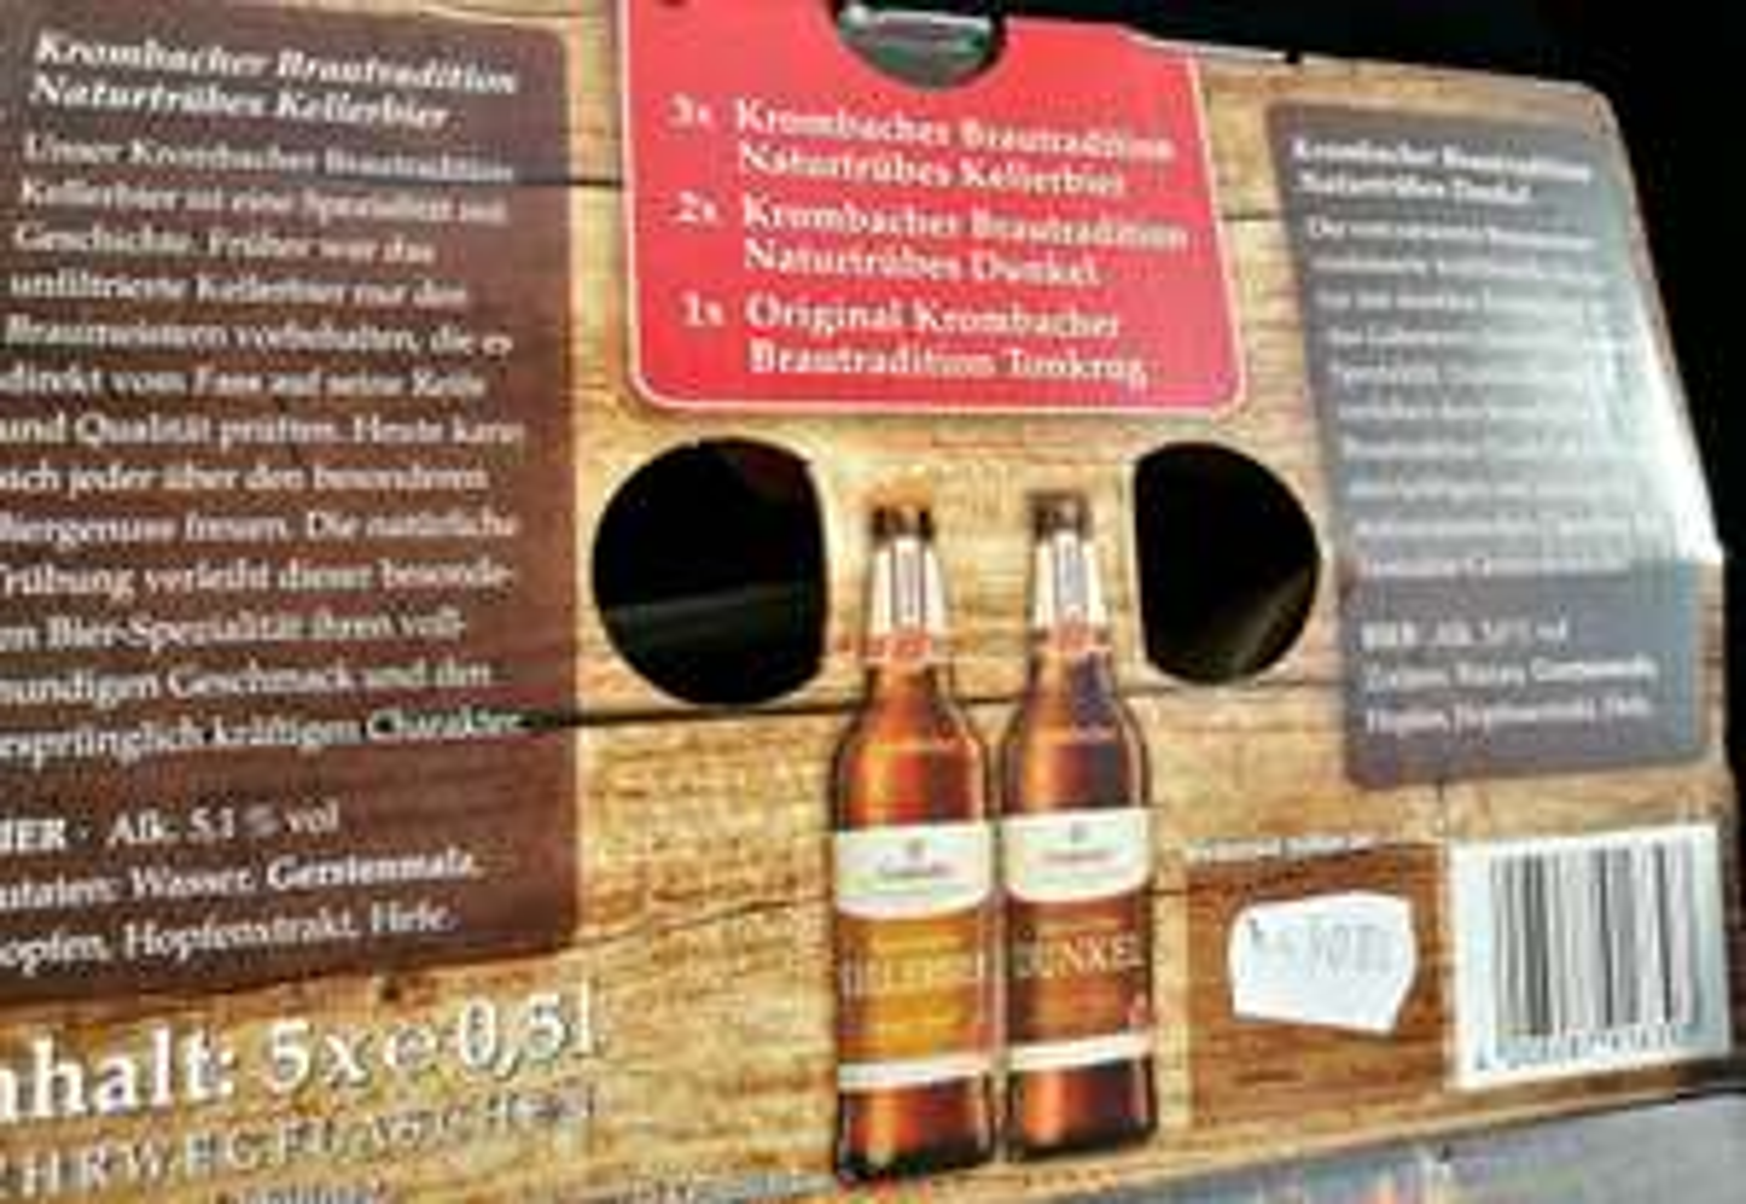 5 x 0.5l Krombacher + original Bierkrug (Lokal Neuss)